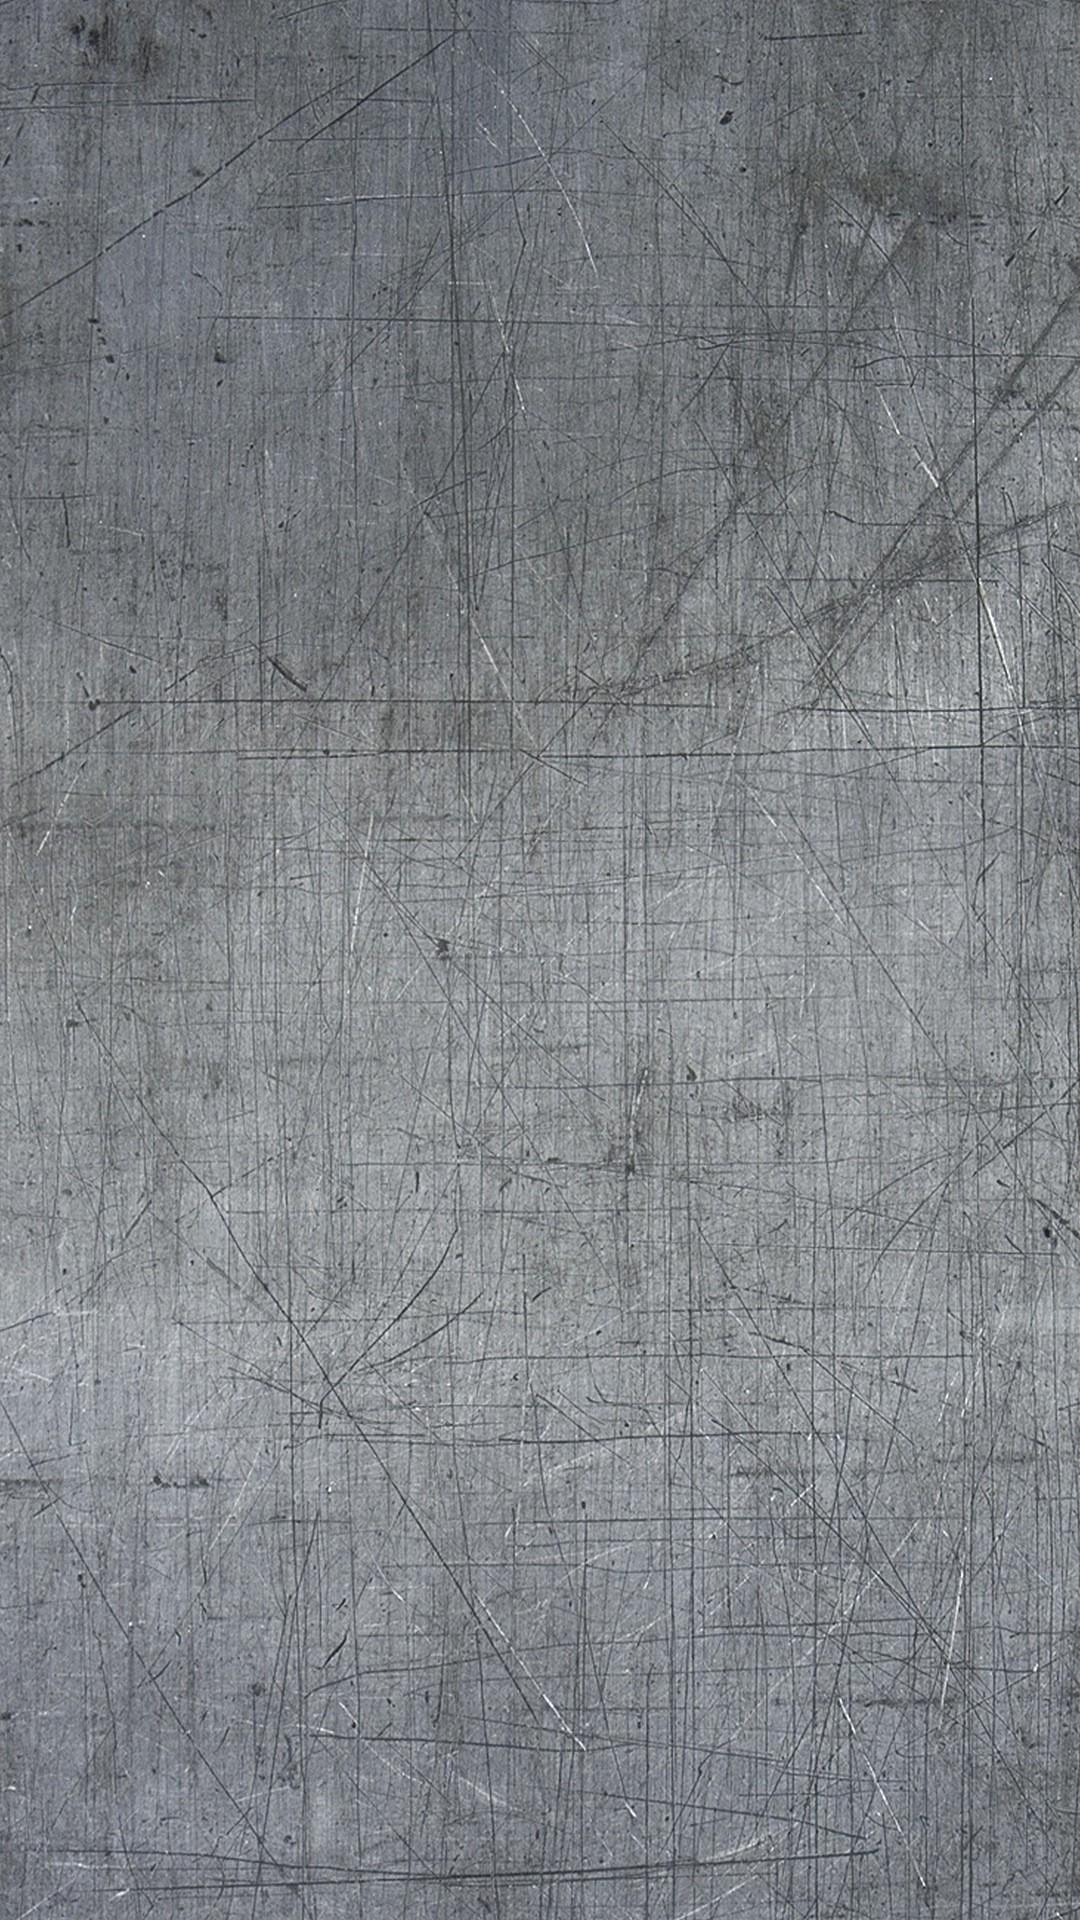 Black Metallic Wallpaper Wallpapers High Definition | HD Wallpapers |  Pinterest | Metallic wallpaper and Wallpaper